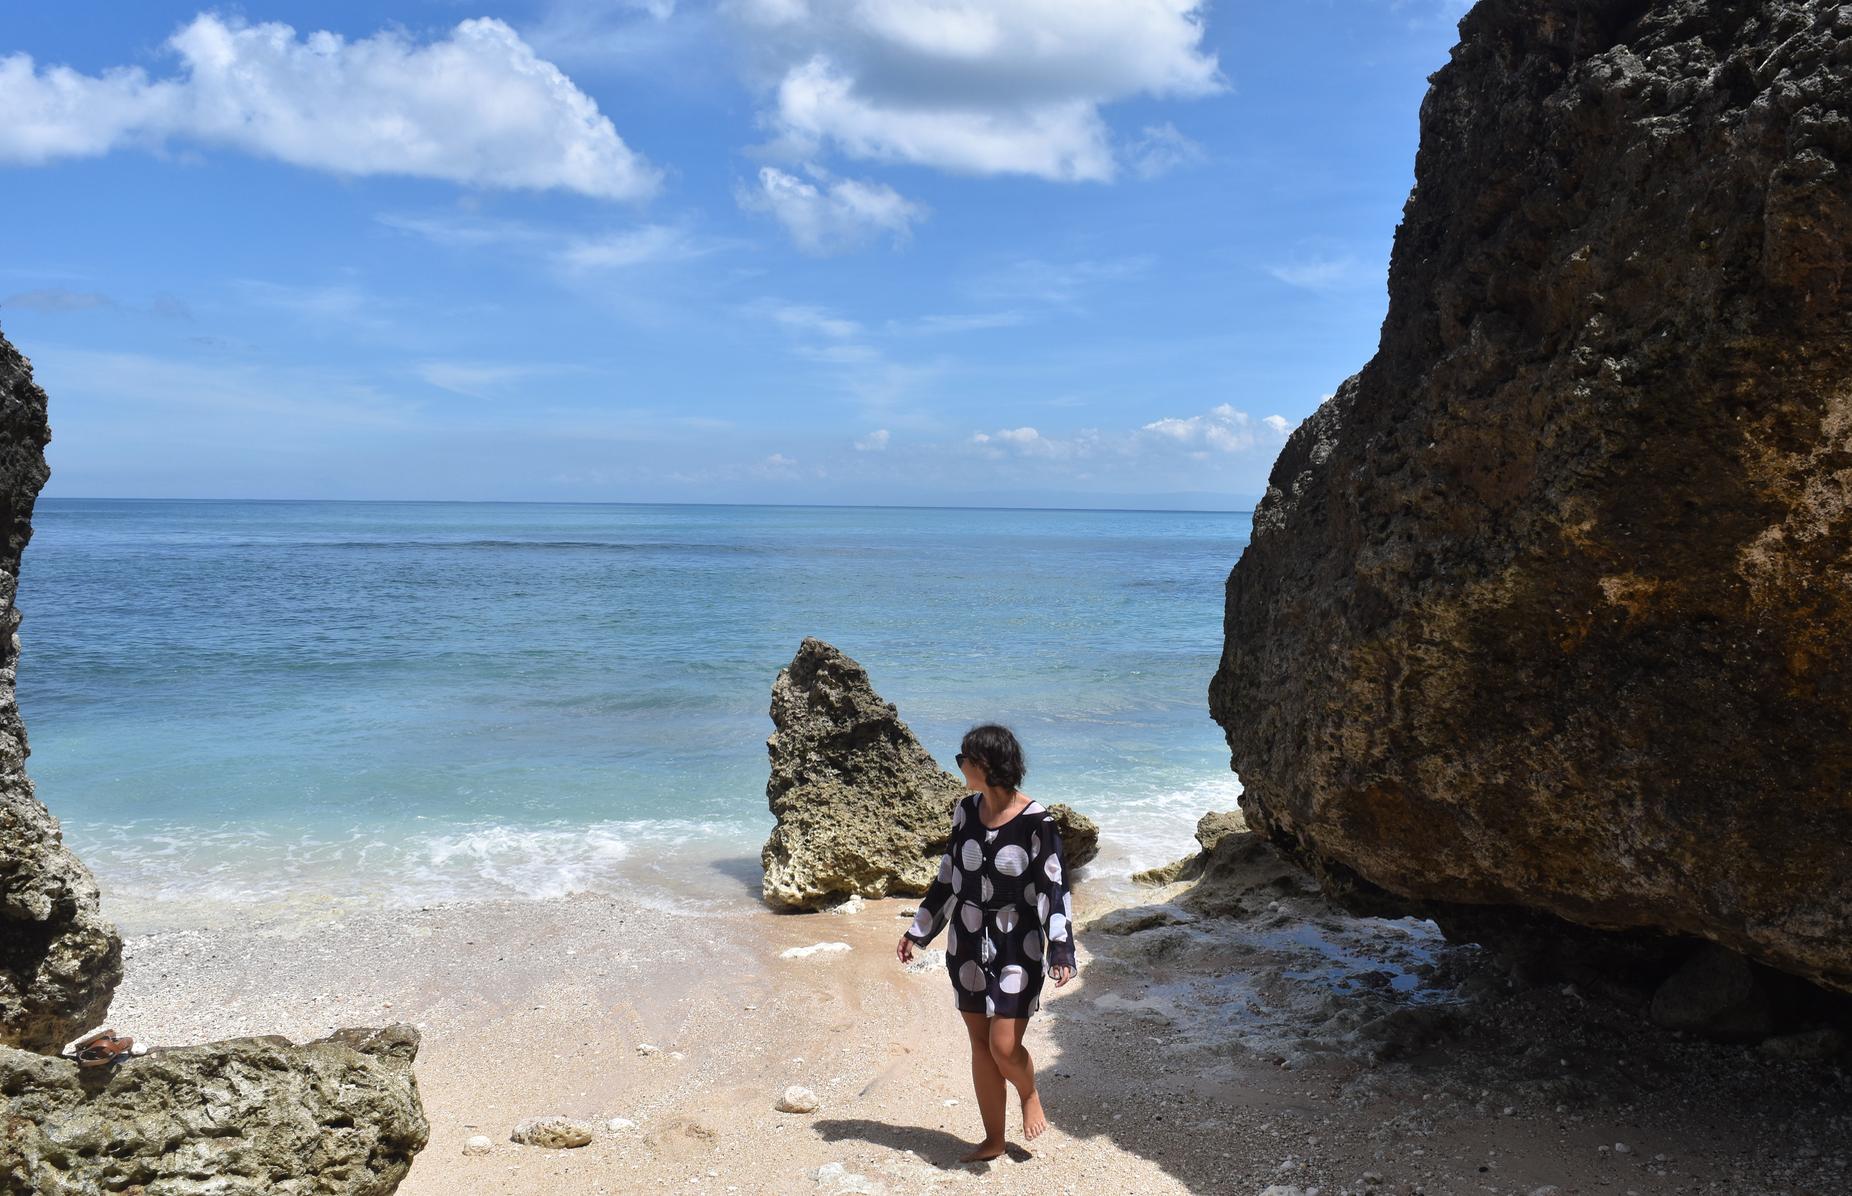 Go to Bali with ILP